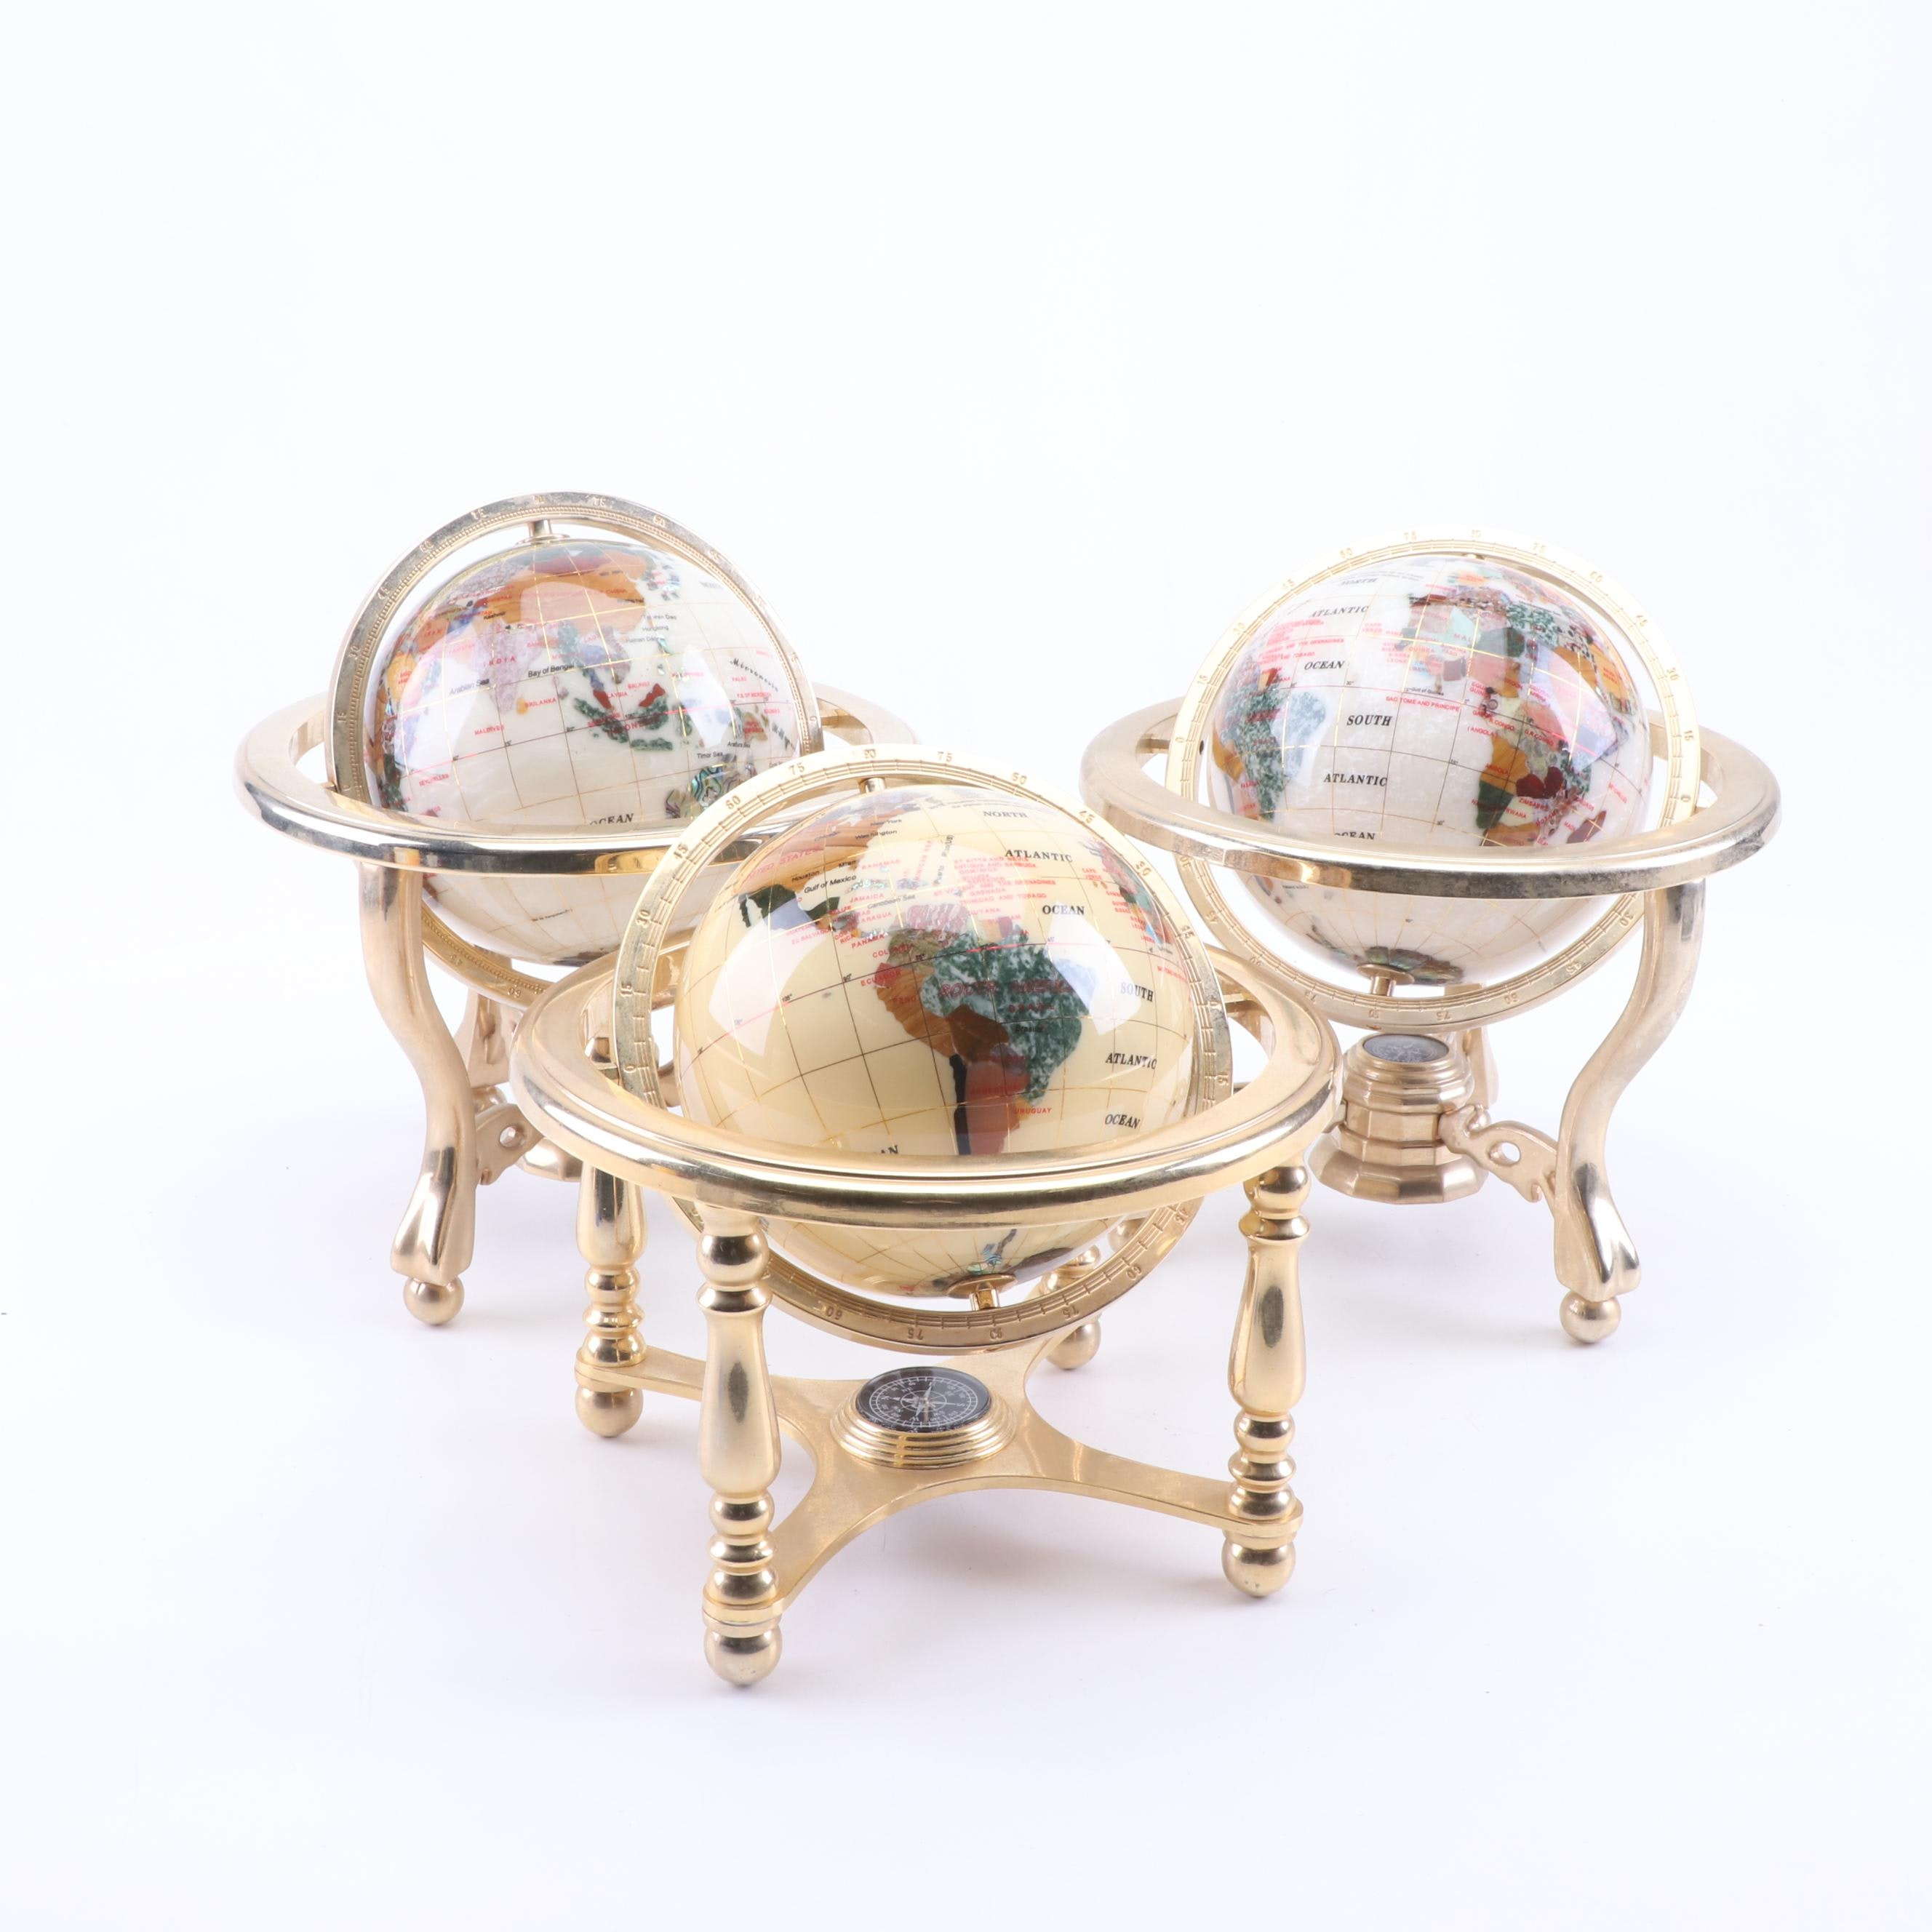 Stone Inlaid Desktop Globes on Brass Stands